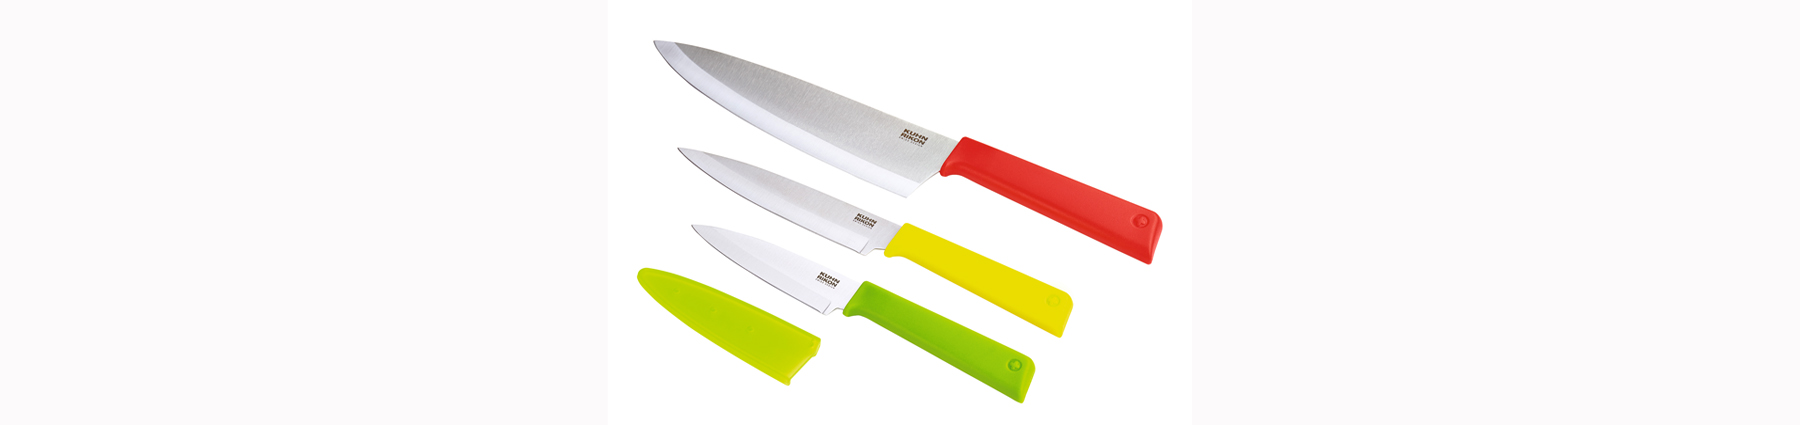 Colori®+ Classic Cutlery